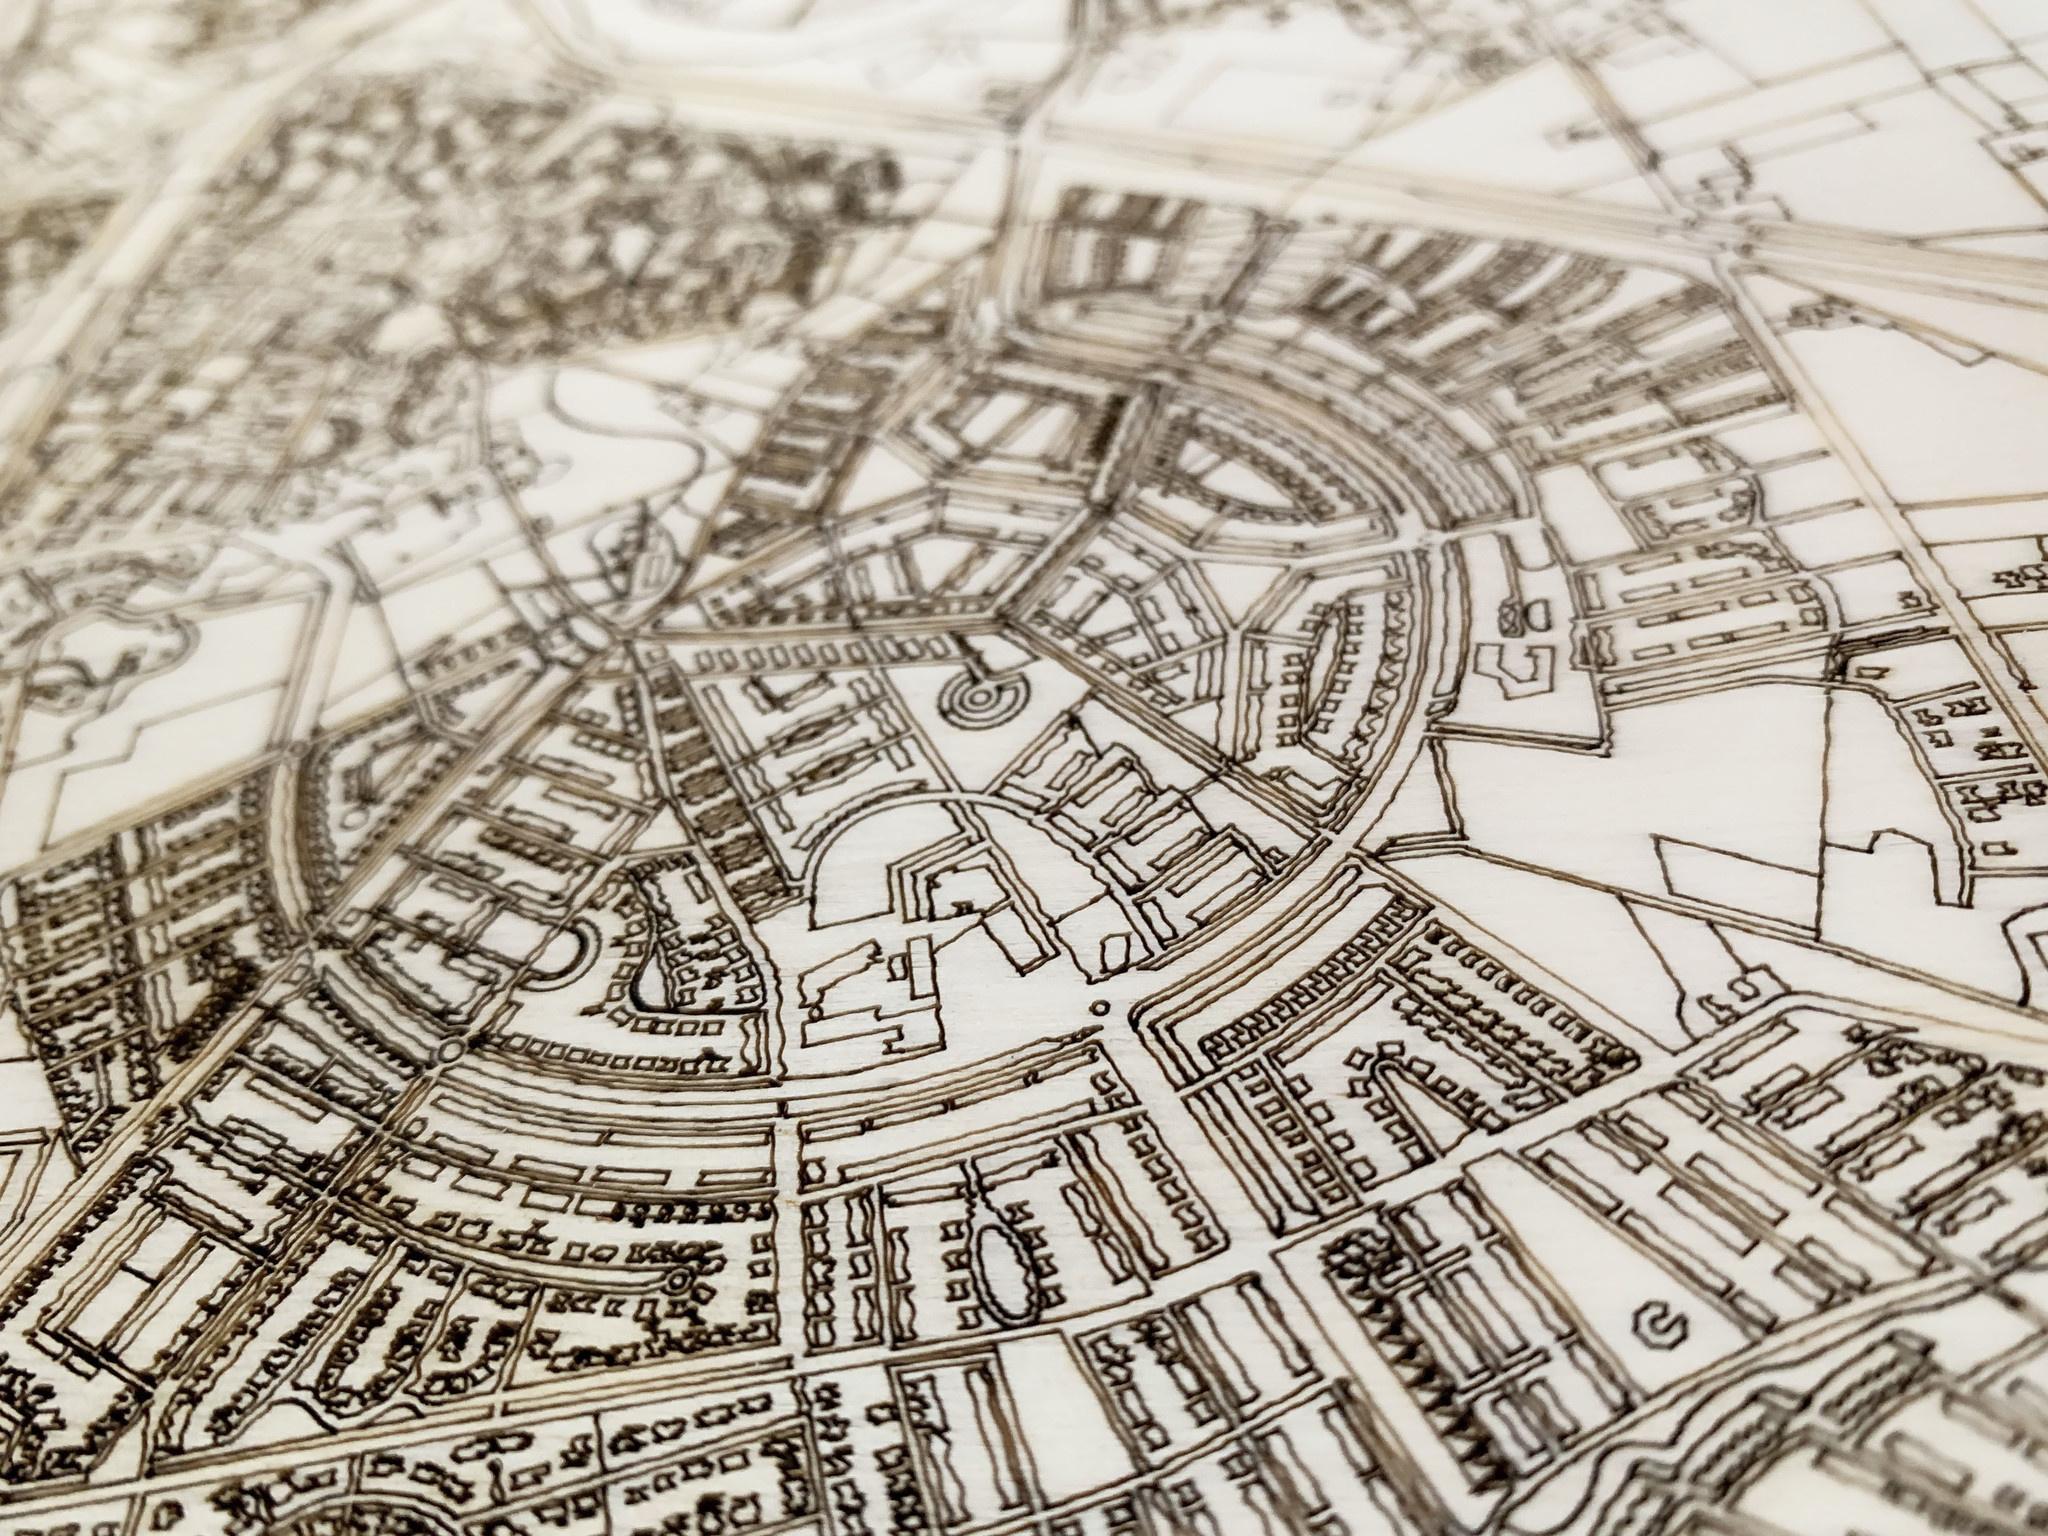 Stadtplan Oosterhout | Wanddekoration Holz-4